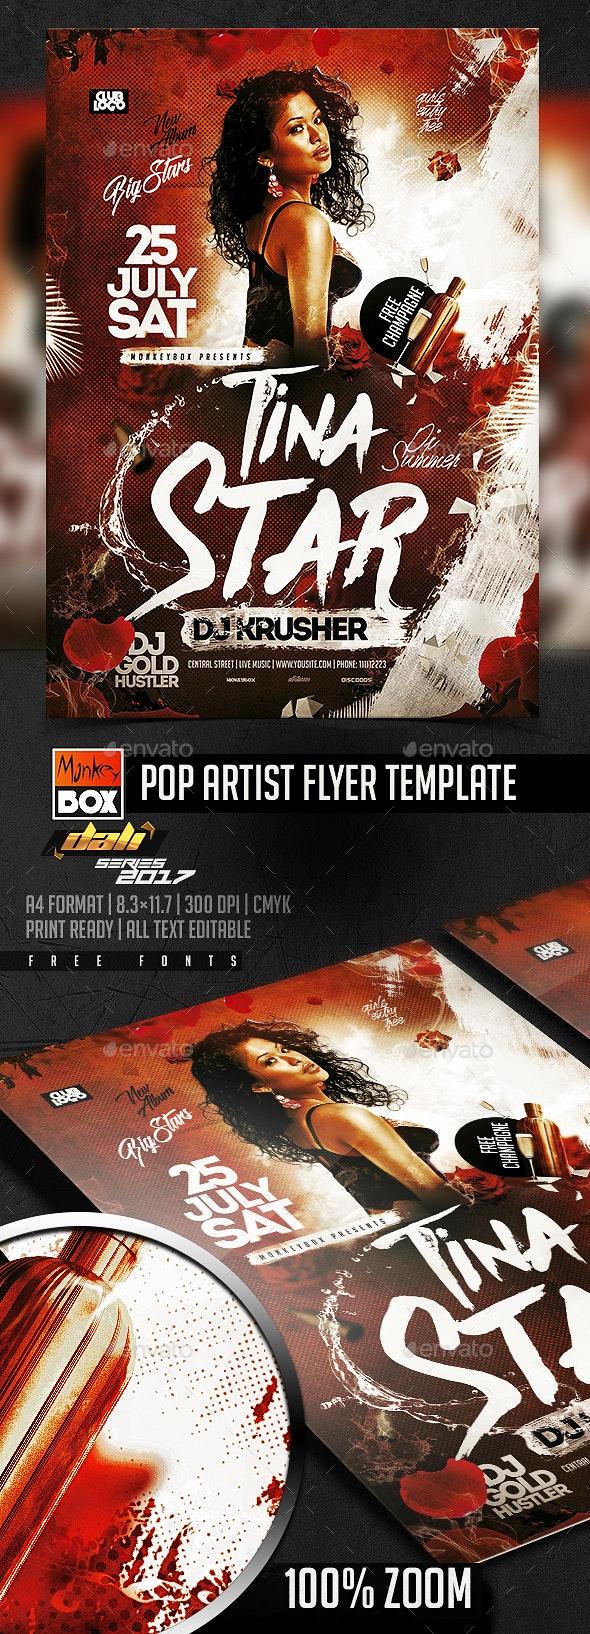 Pop Artist Flyer Template - Flyers Print Templates